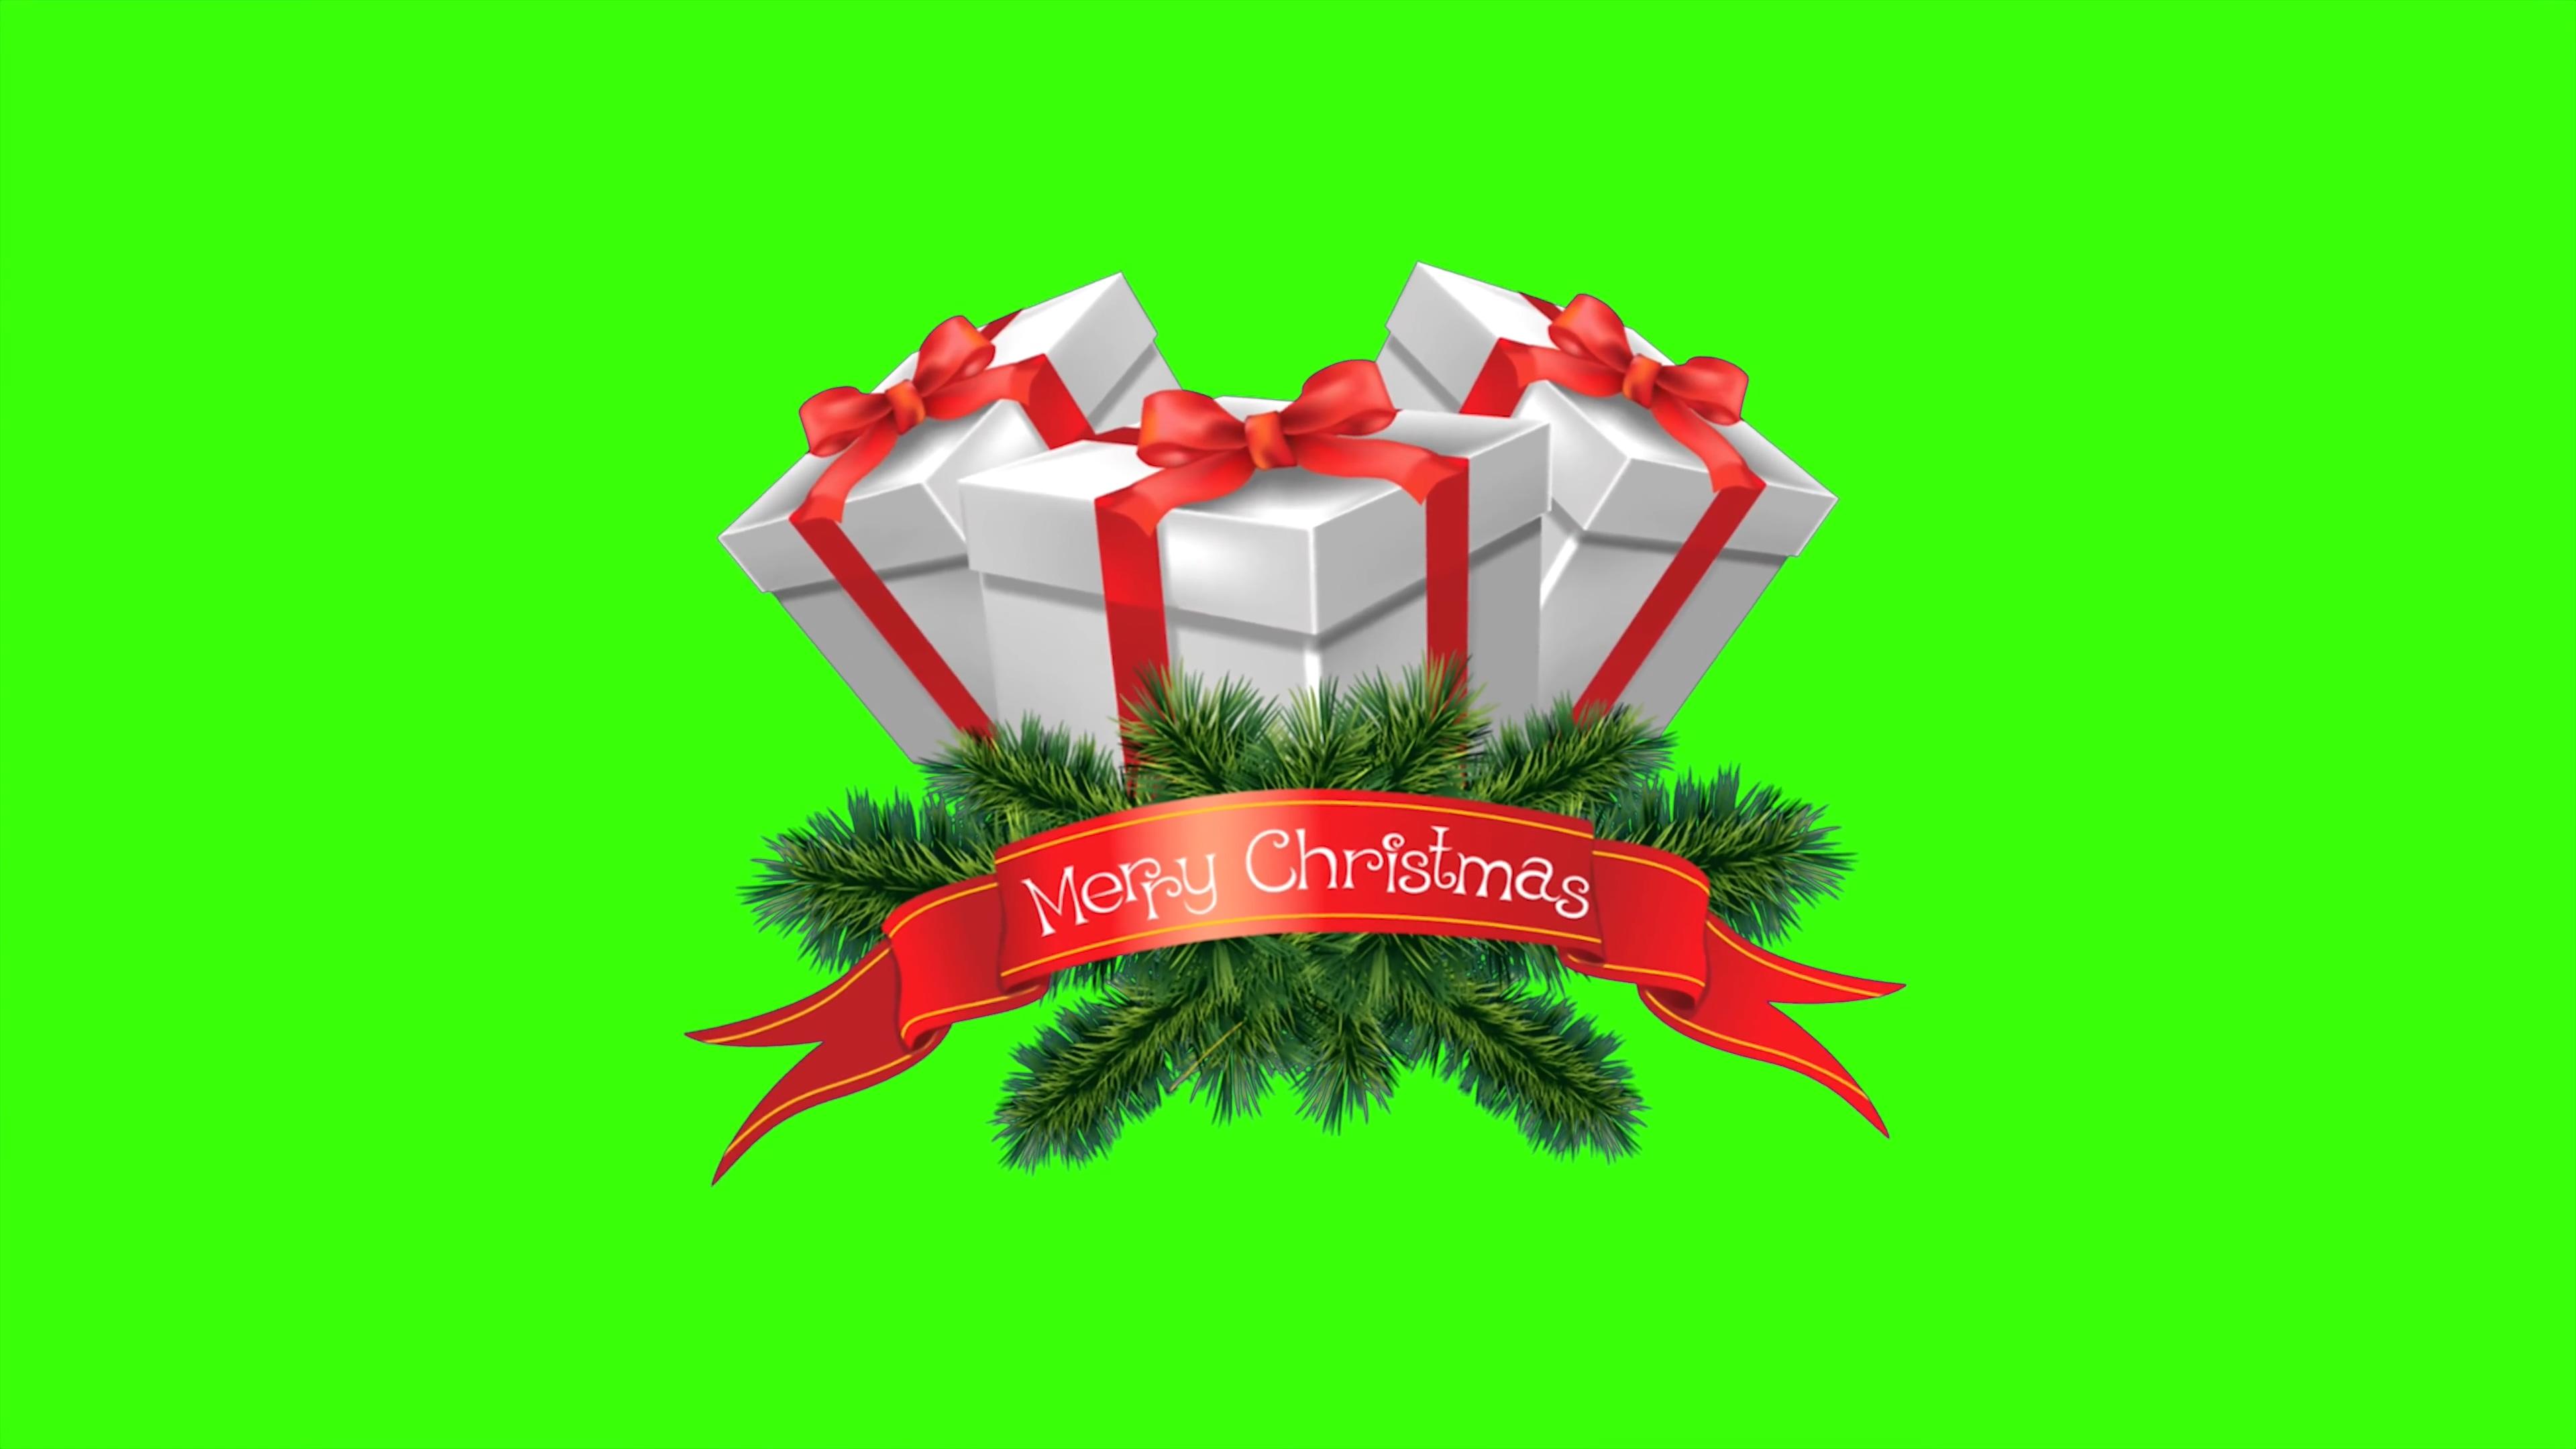 \[4K\]绿屏抠像圣诞节礼物盒